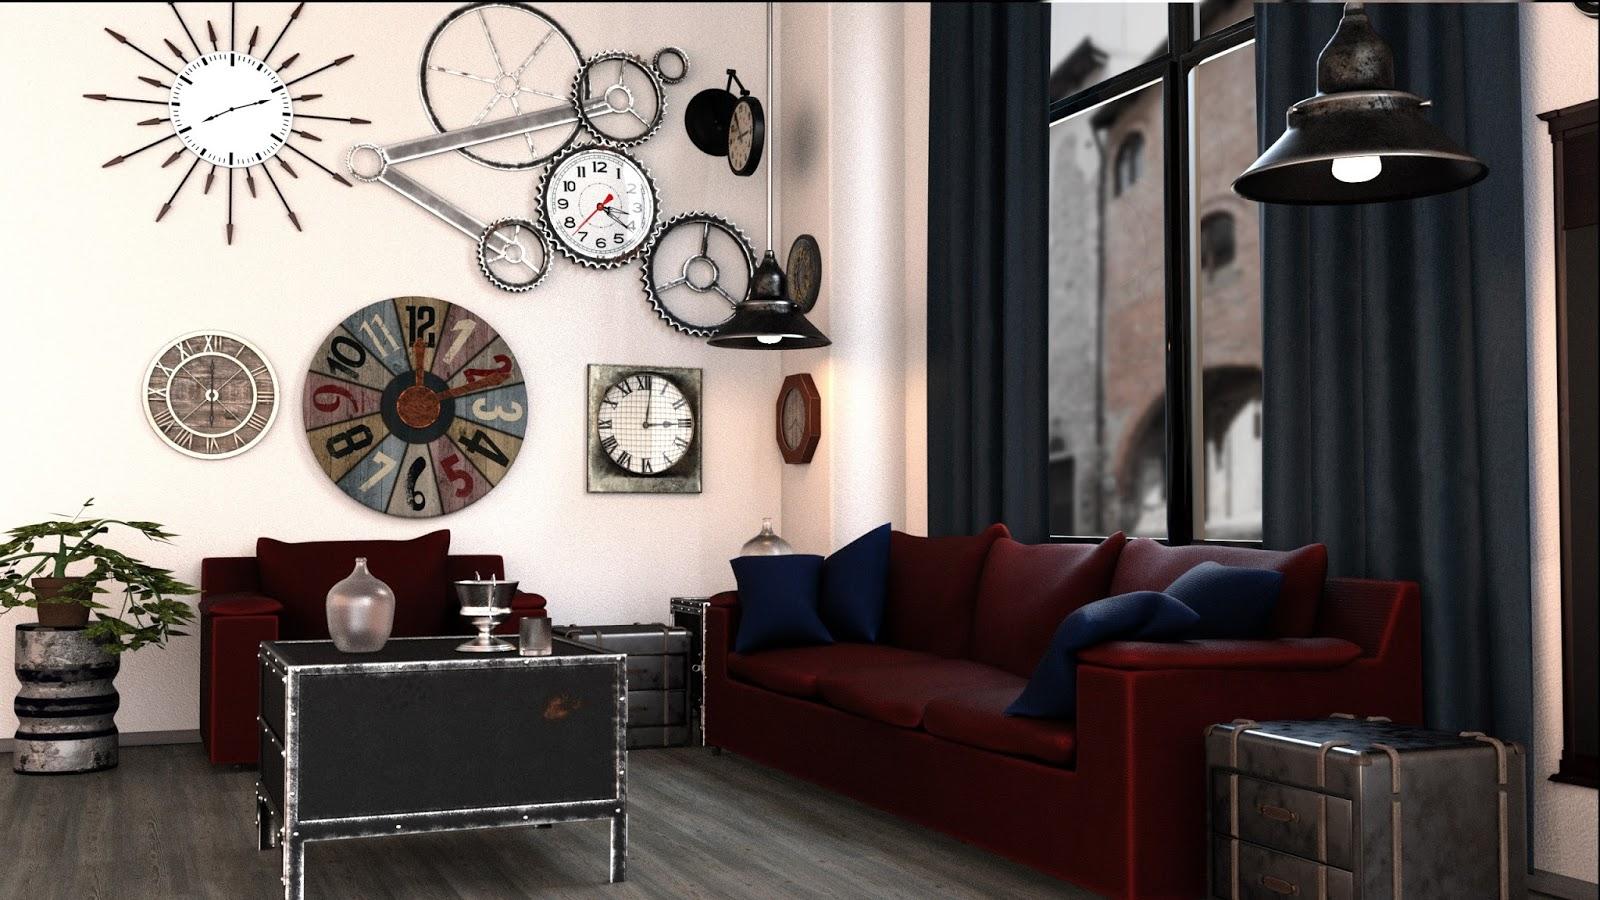 Download daz studio 3 for free daz 3d i13 living in style for Living room 2 for daz studio